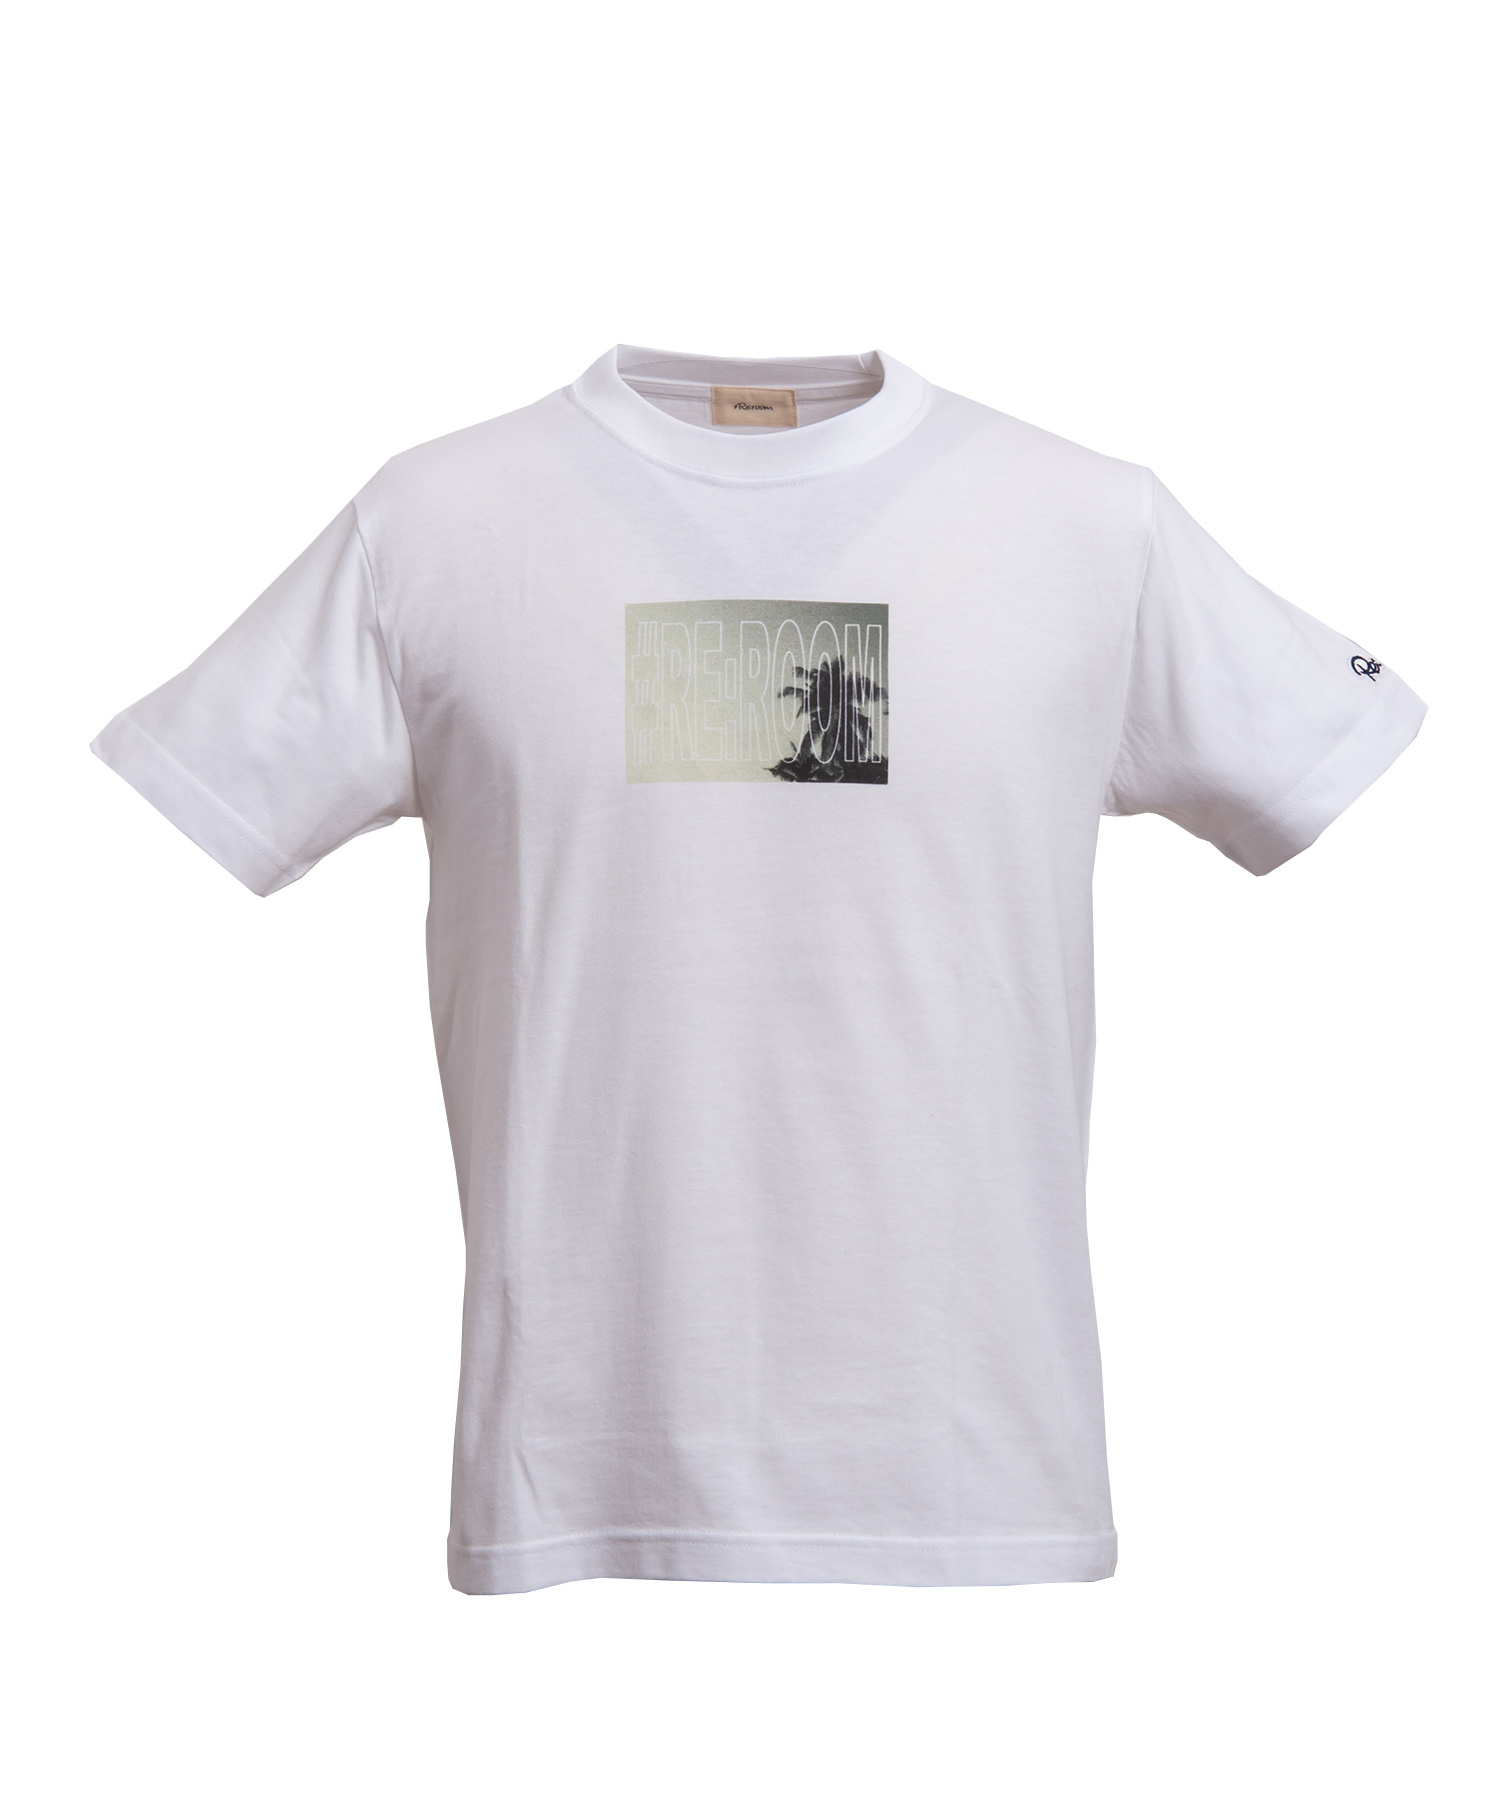 PALM TREE SMALL PHOTO LOGO T-shirt[REC216]